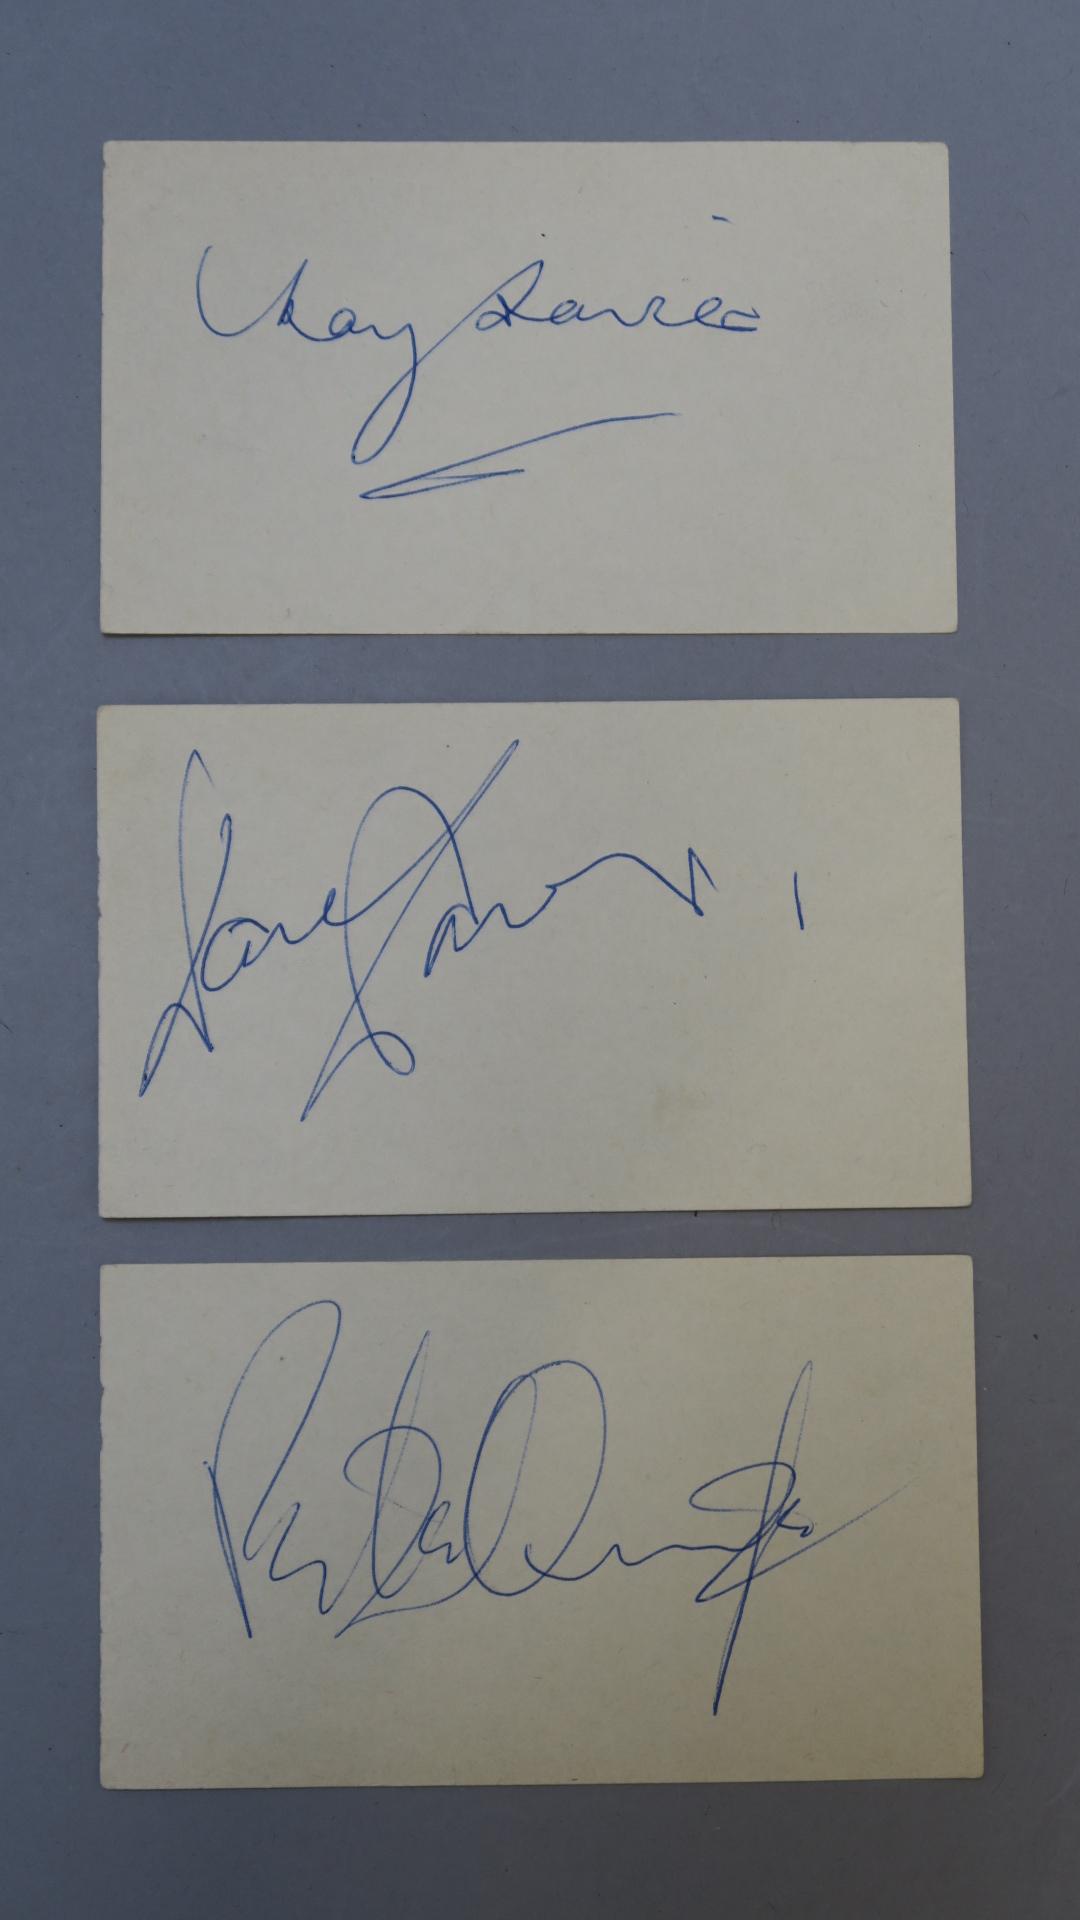 Lot 18 - The Kinks autographs Ray Davies, Dave Davies,